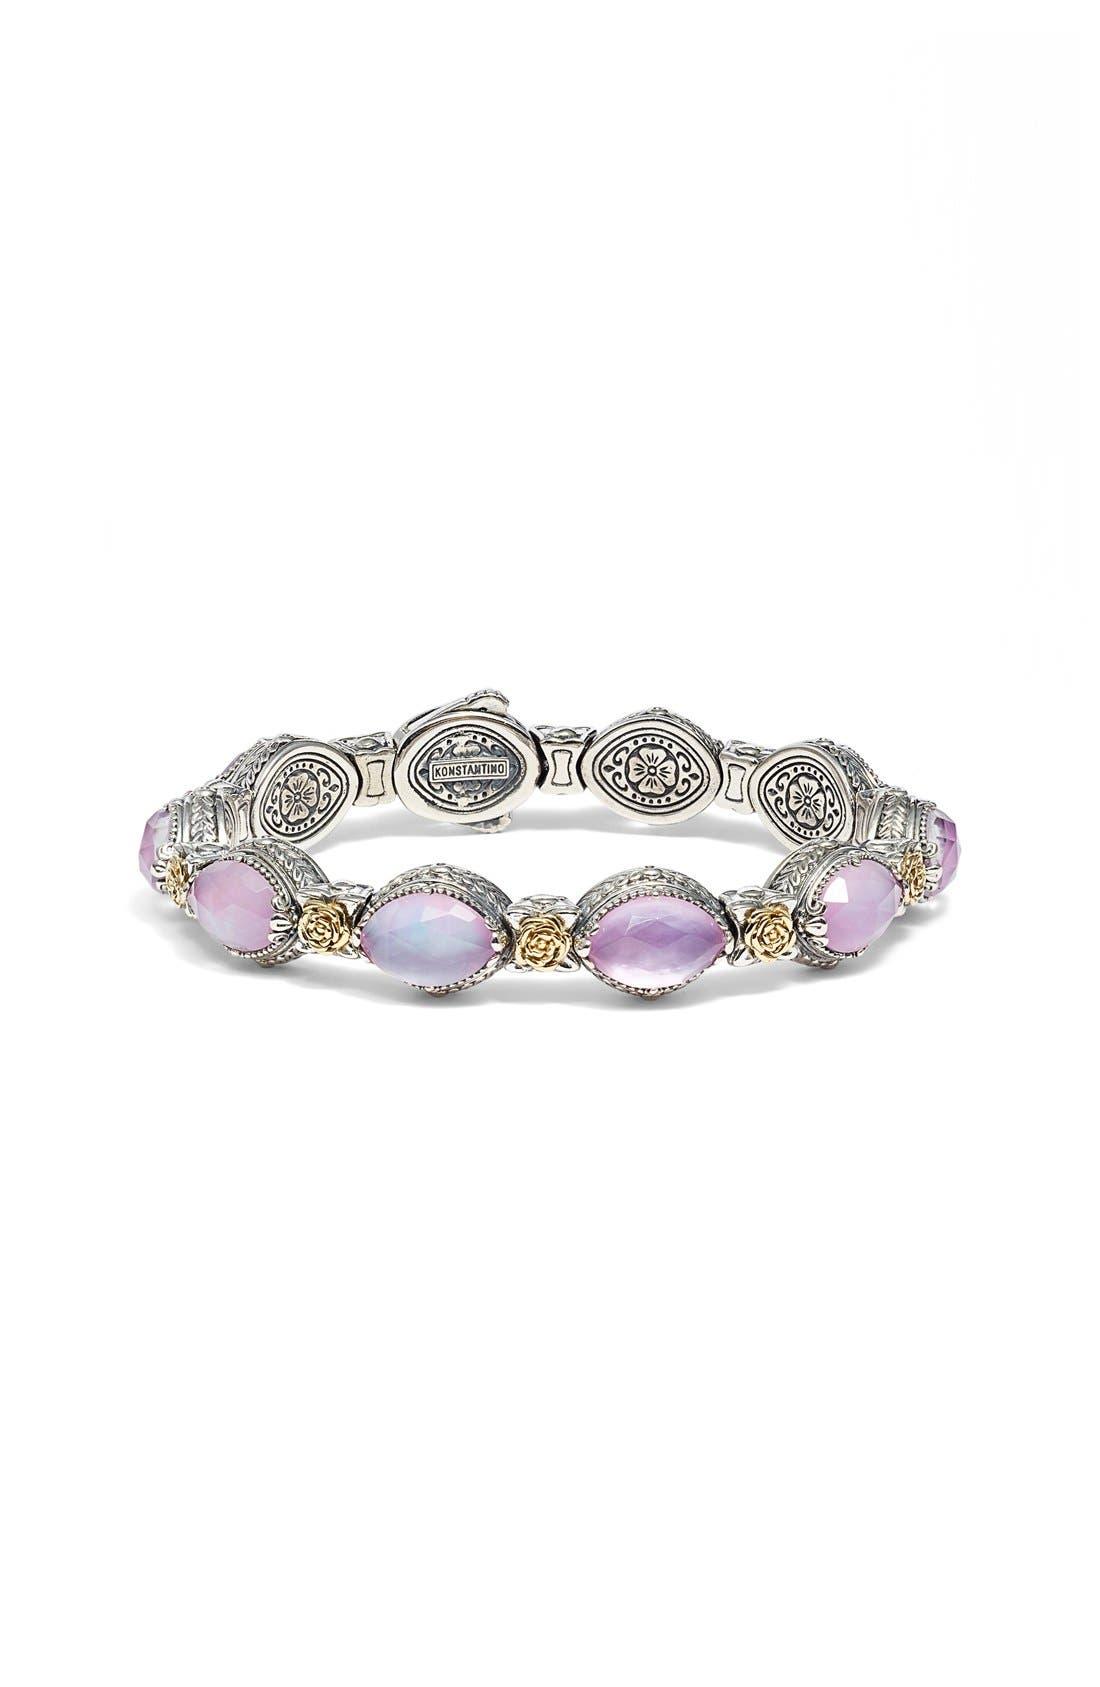 Main Image - Konstantino 'Iliada' Stone Link Bracelet